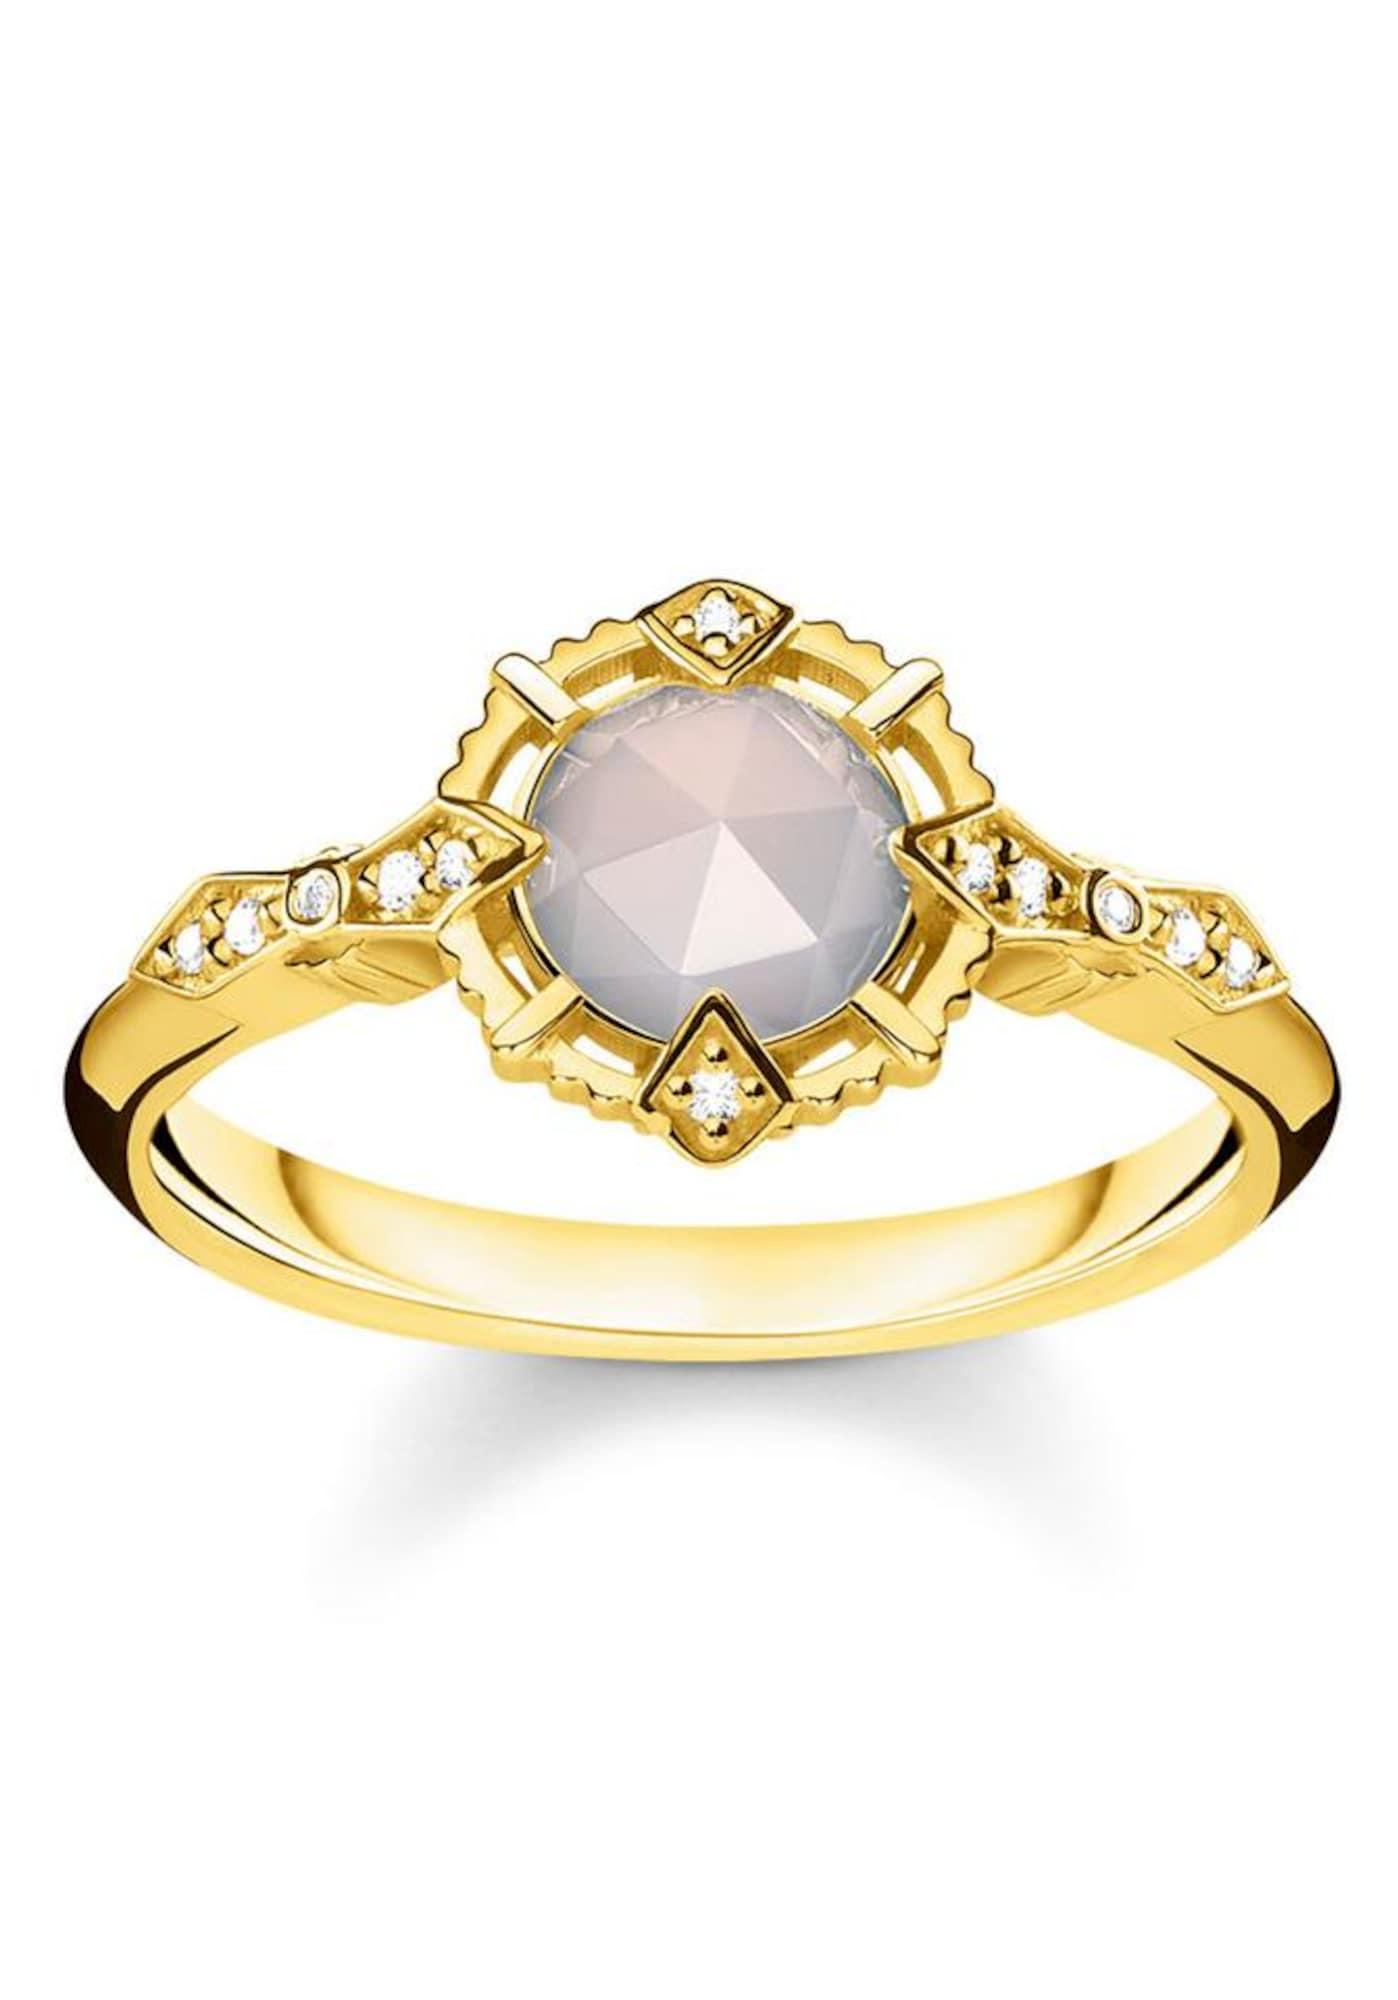 Diamantring 'Vintage'   Schmuck > Ringe > Diamantringe   Gold   Thomas Sabo